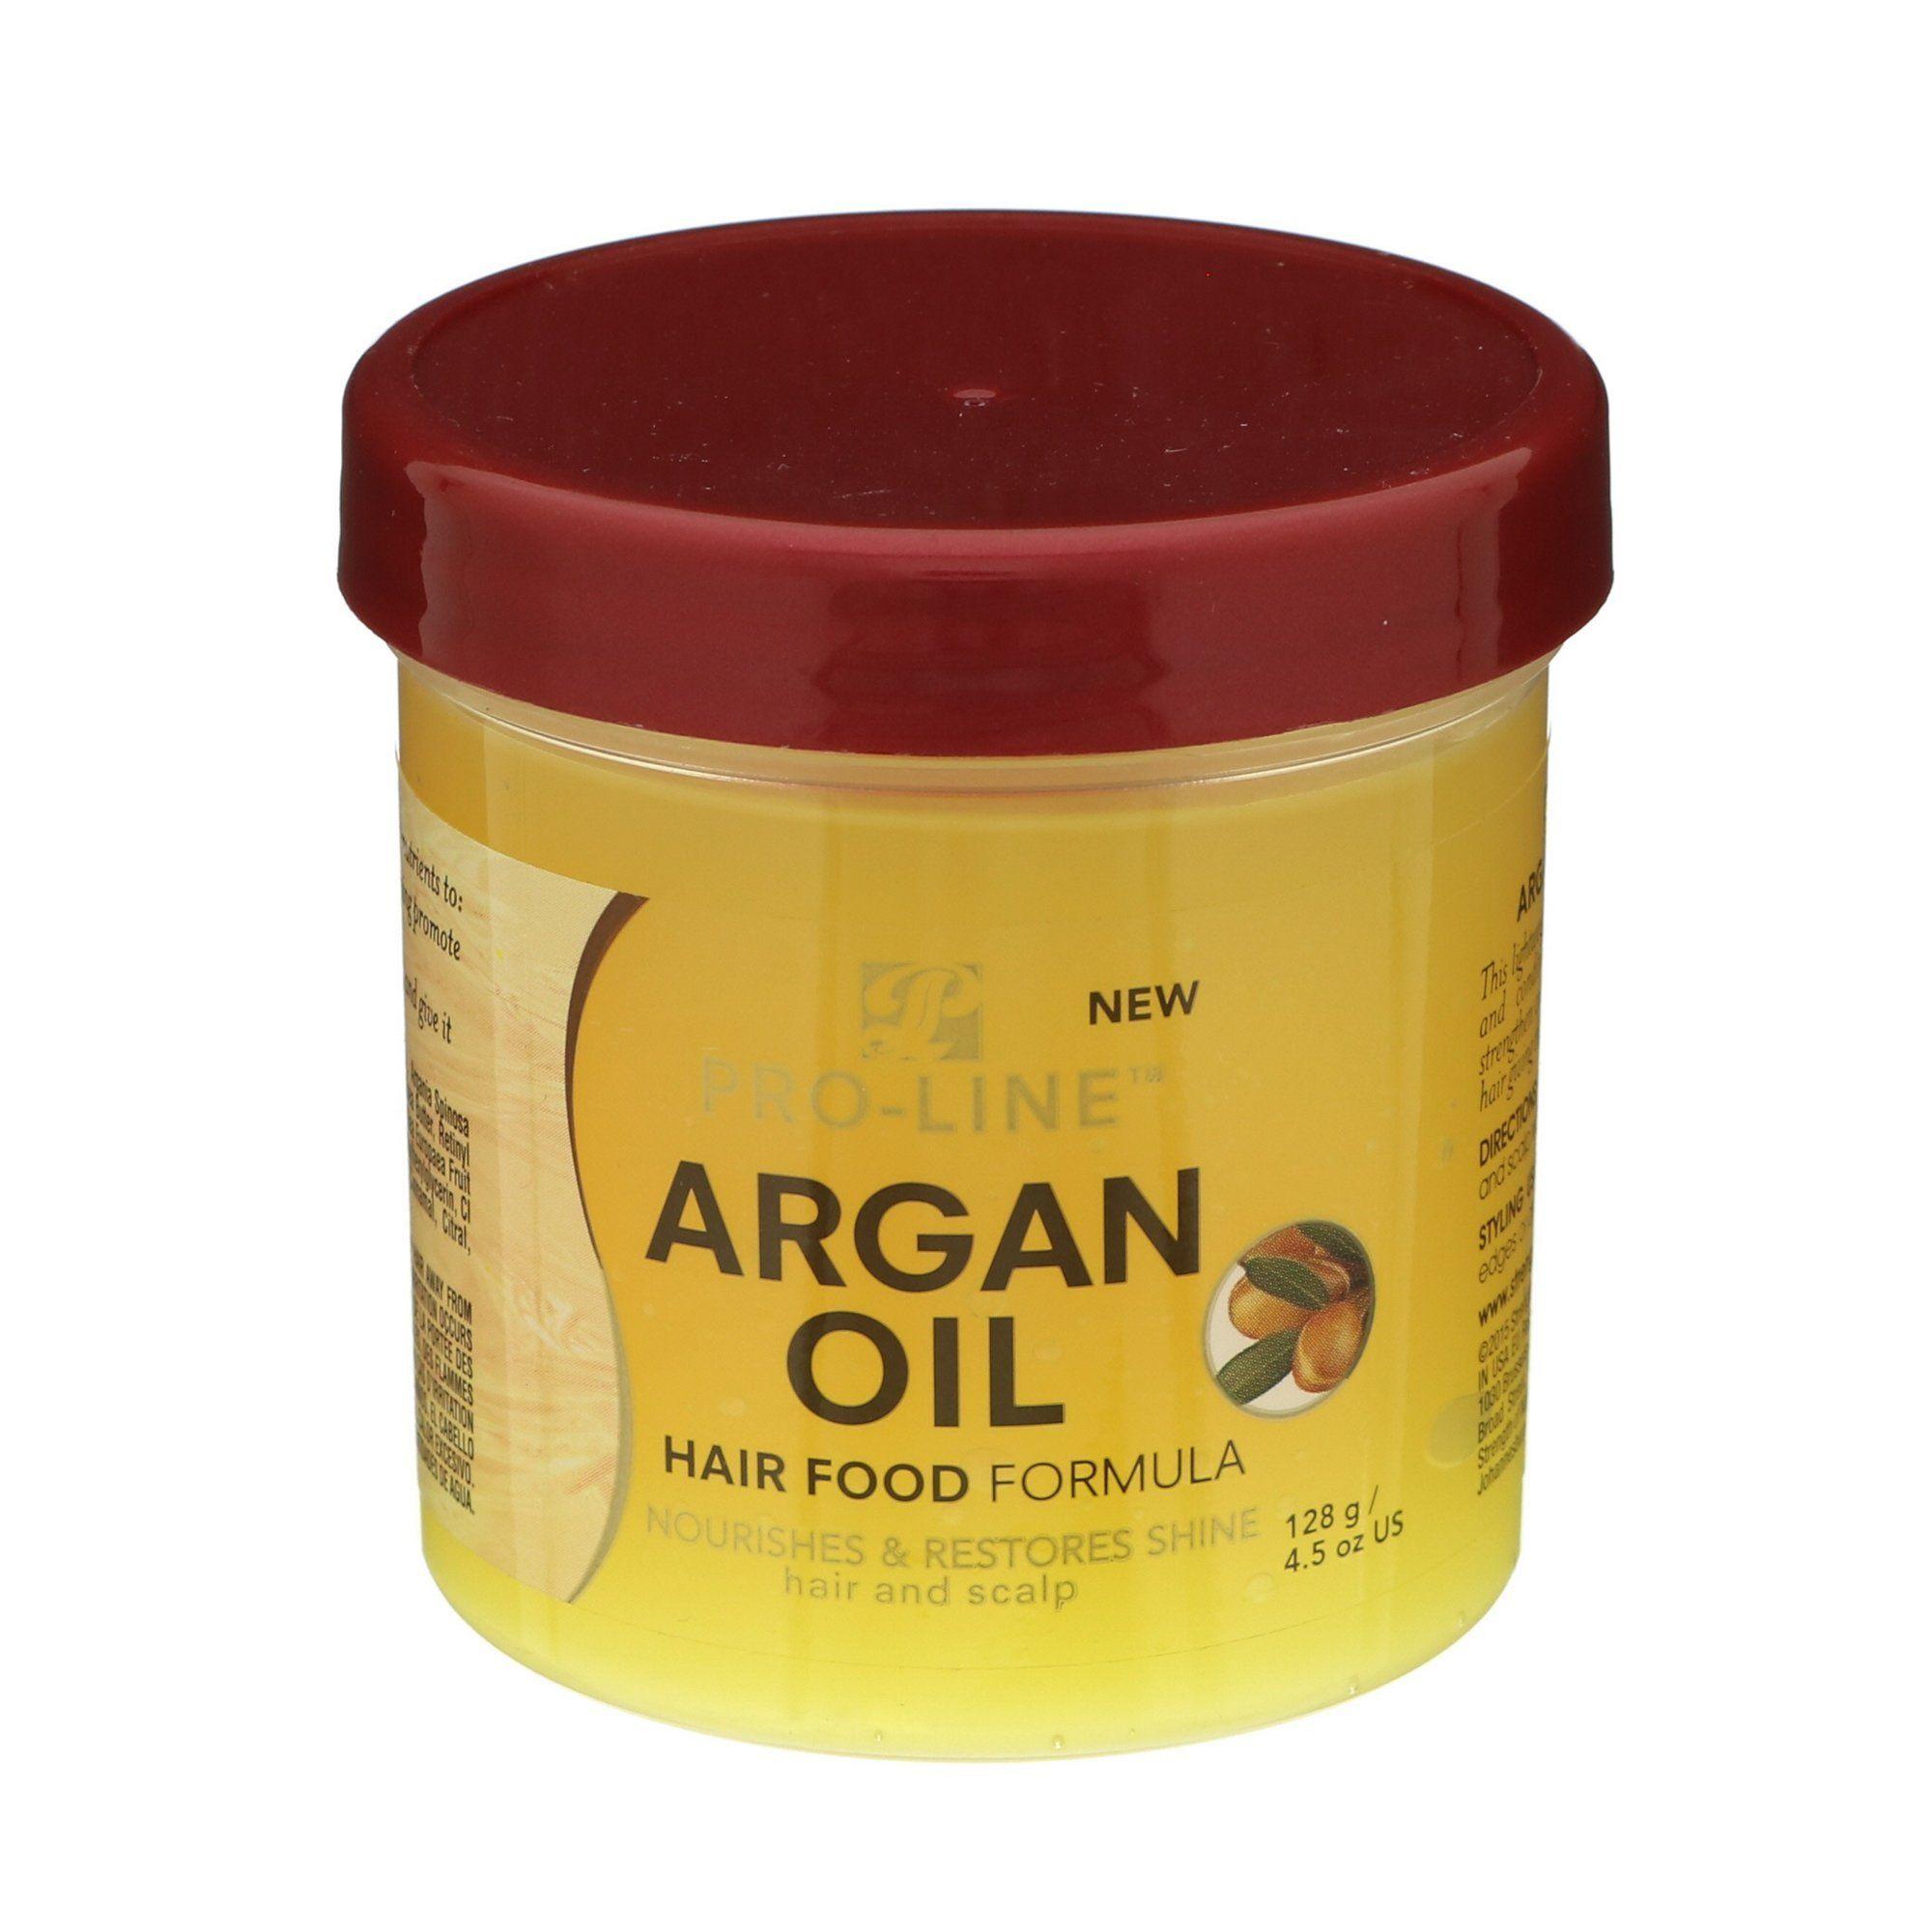 Pro-Line Argan Oil Hair Food Formula - 128g